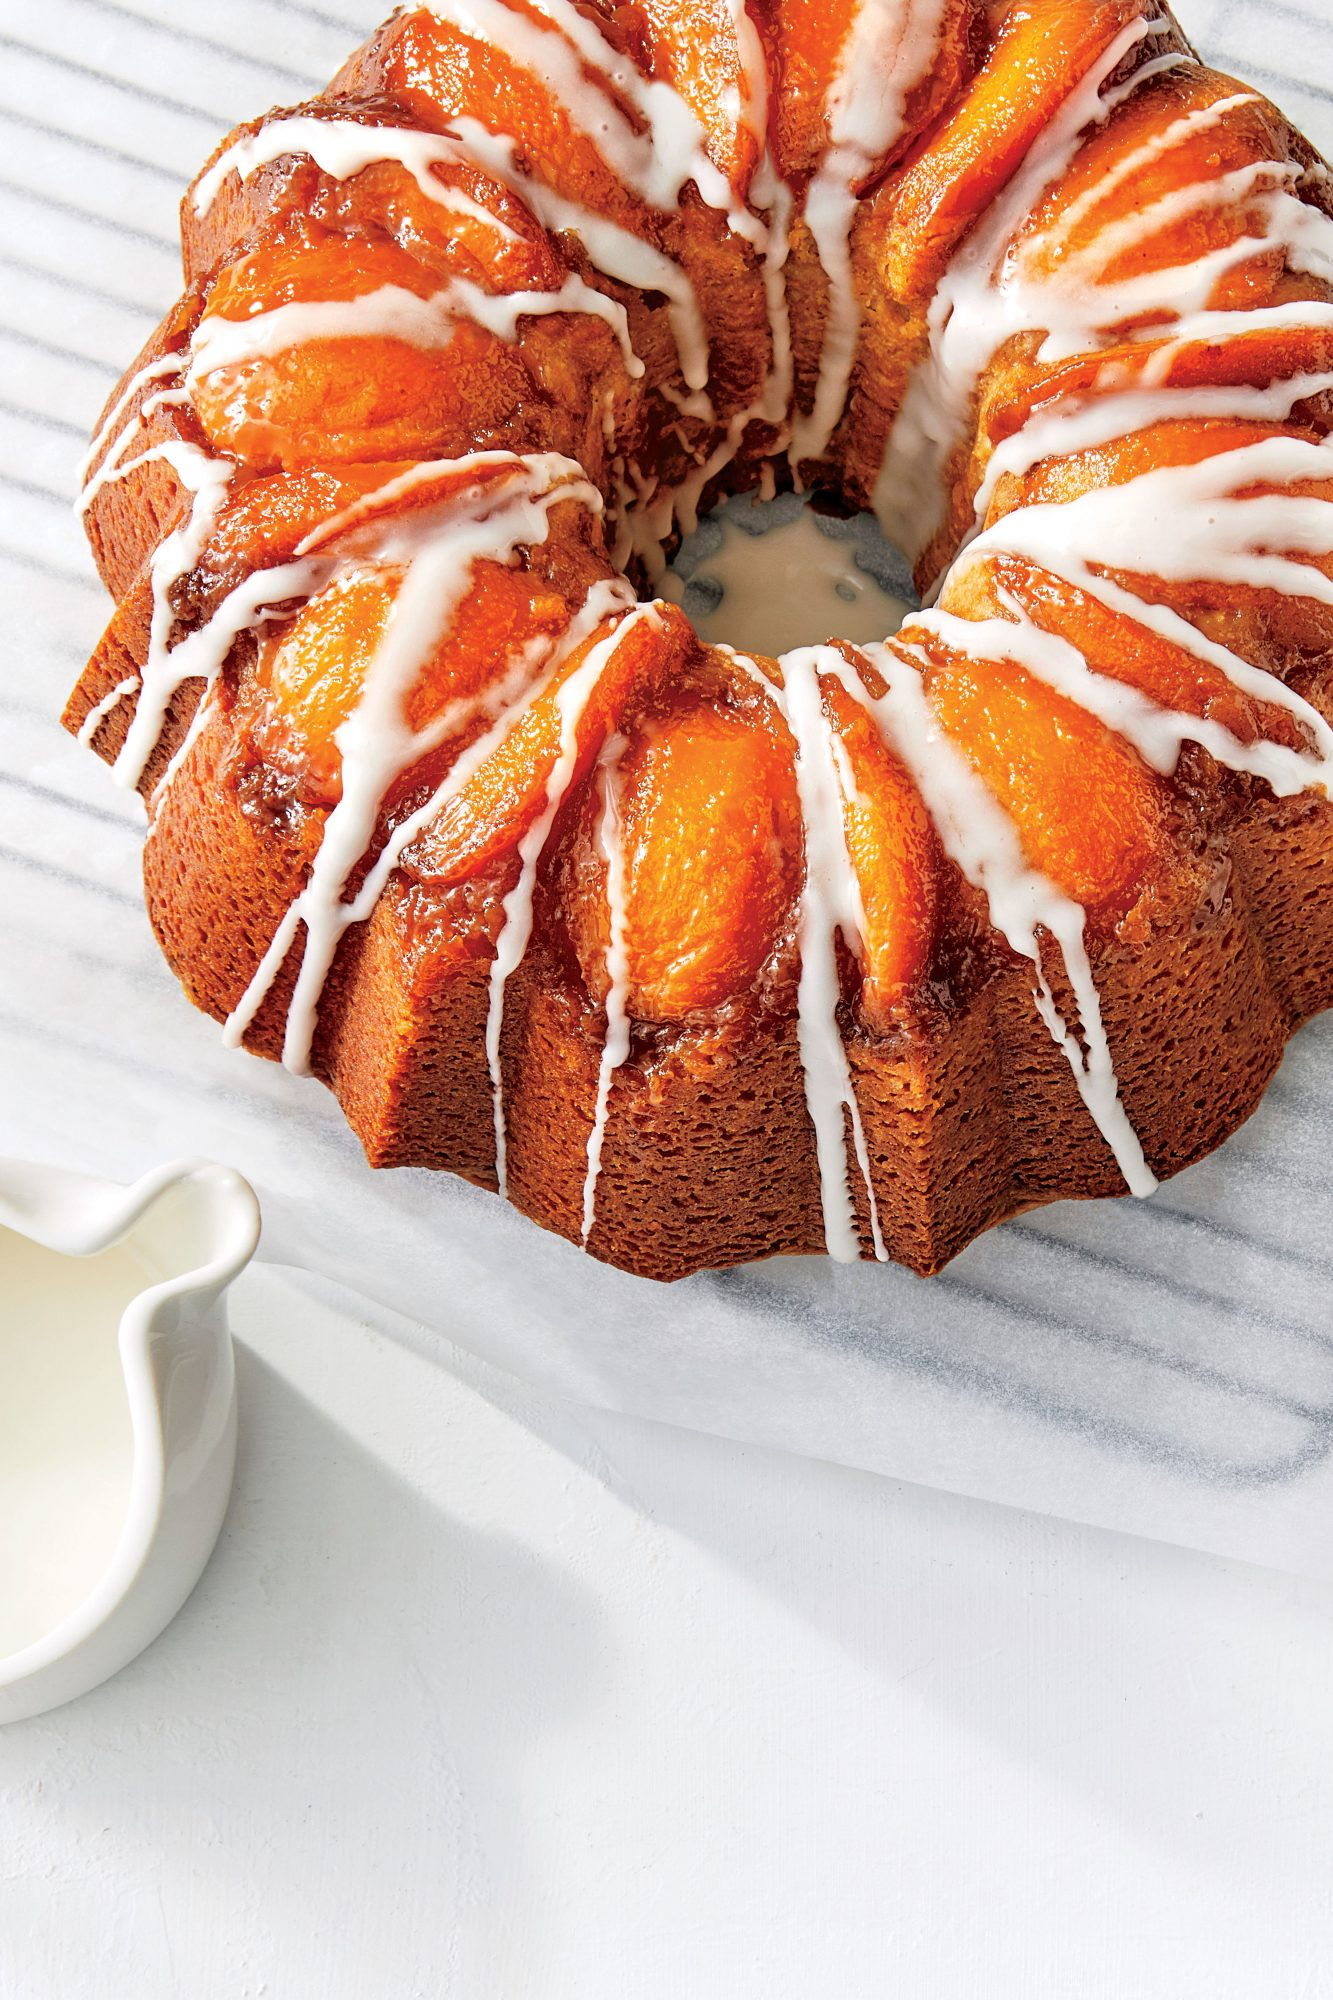 Peach-Bourbon Upside-Down Bundt Cake